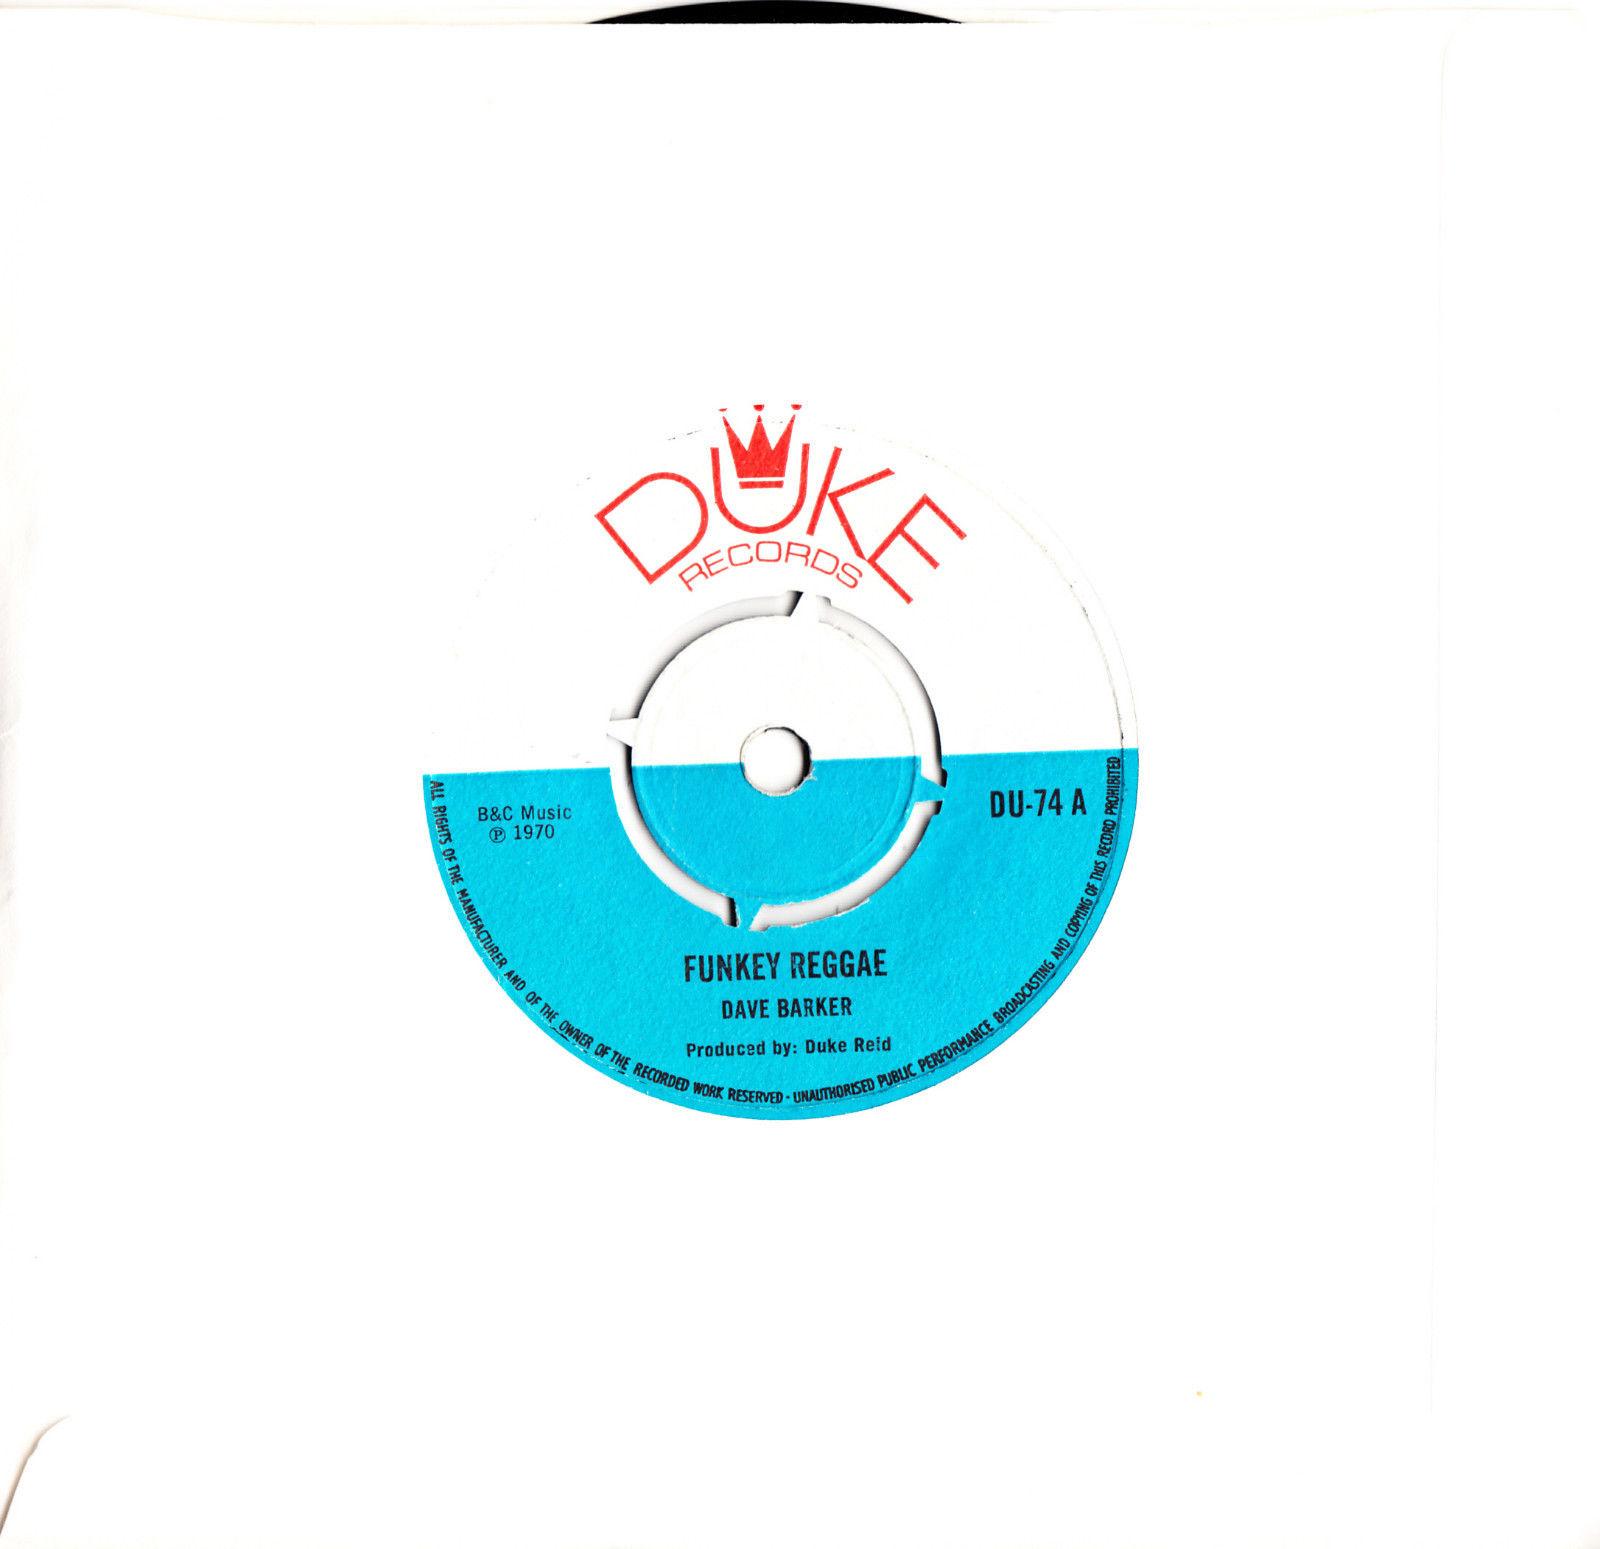 ROOTS REGGAE VINYL 7in RECORD Funky Reggae - Dave Barker / I Love You My Baby -